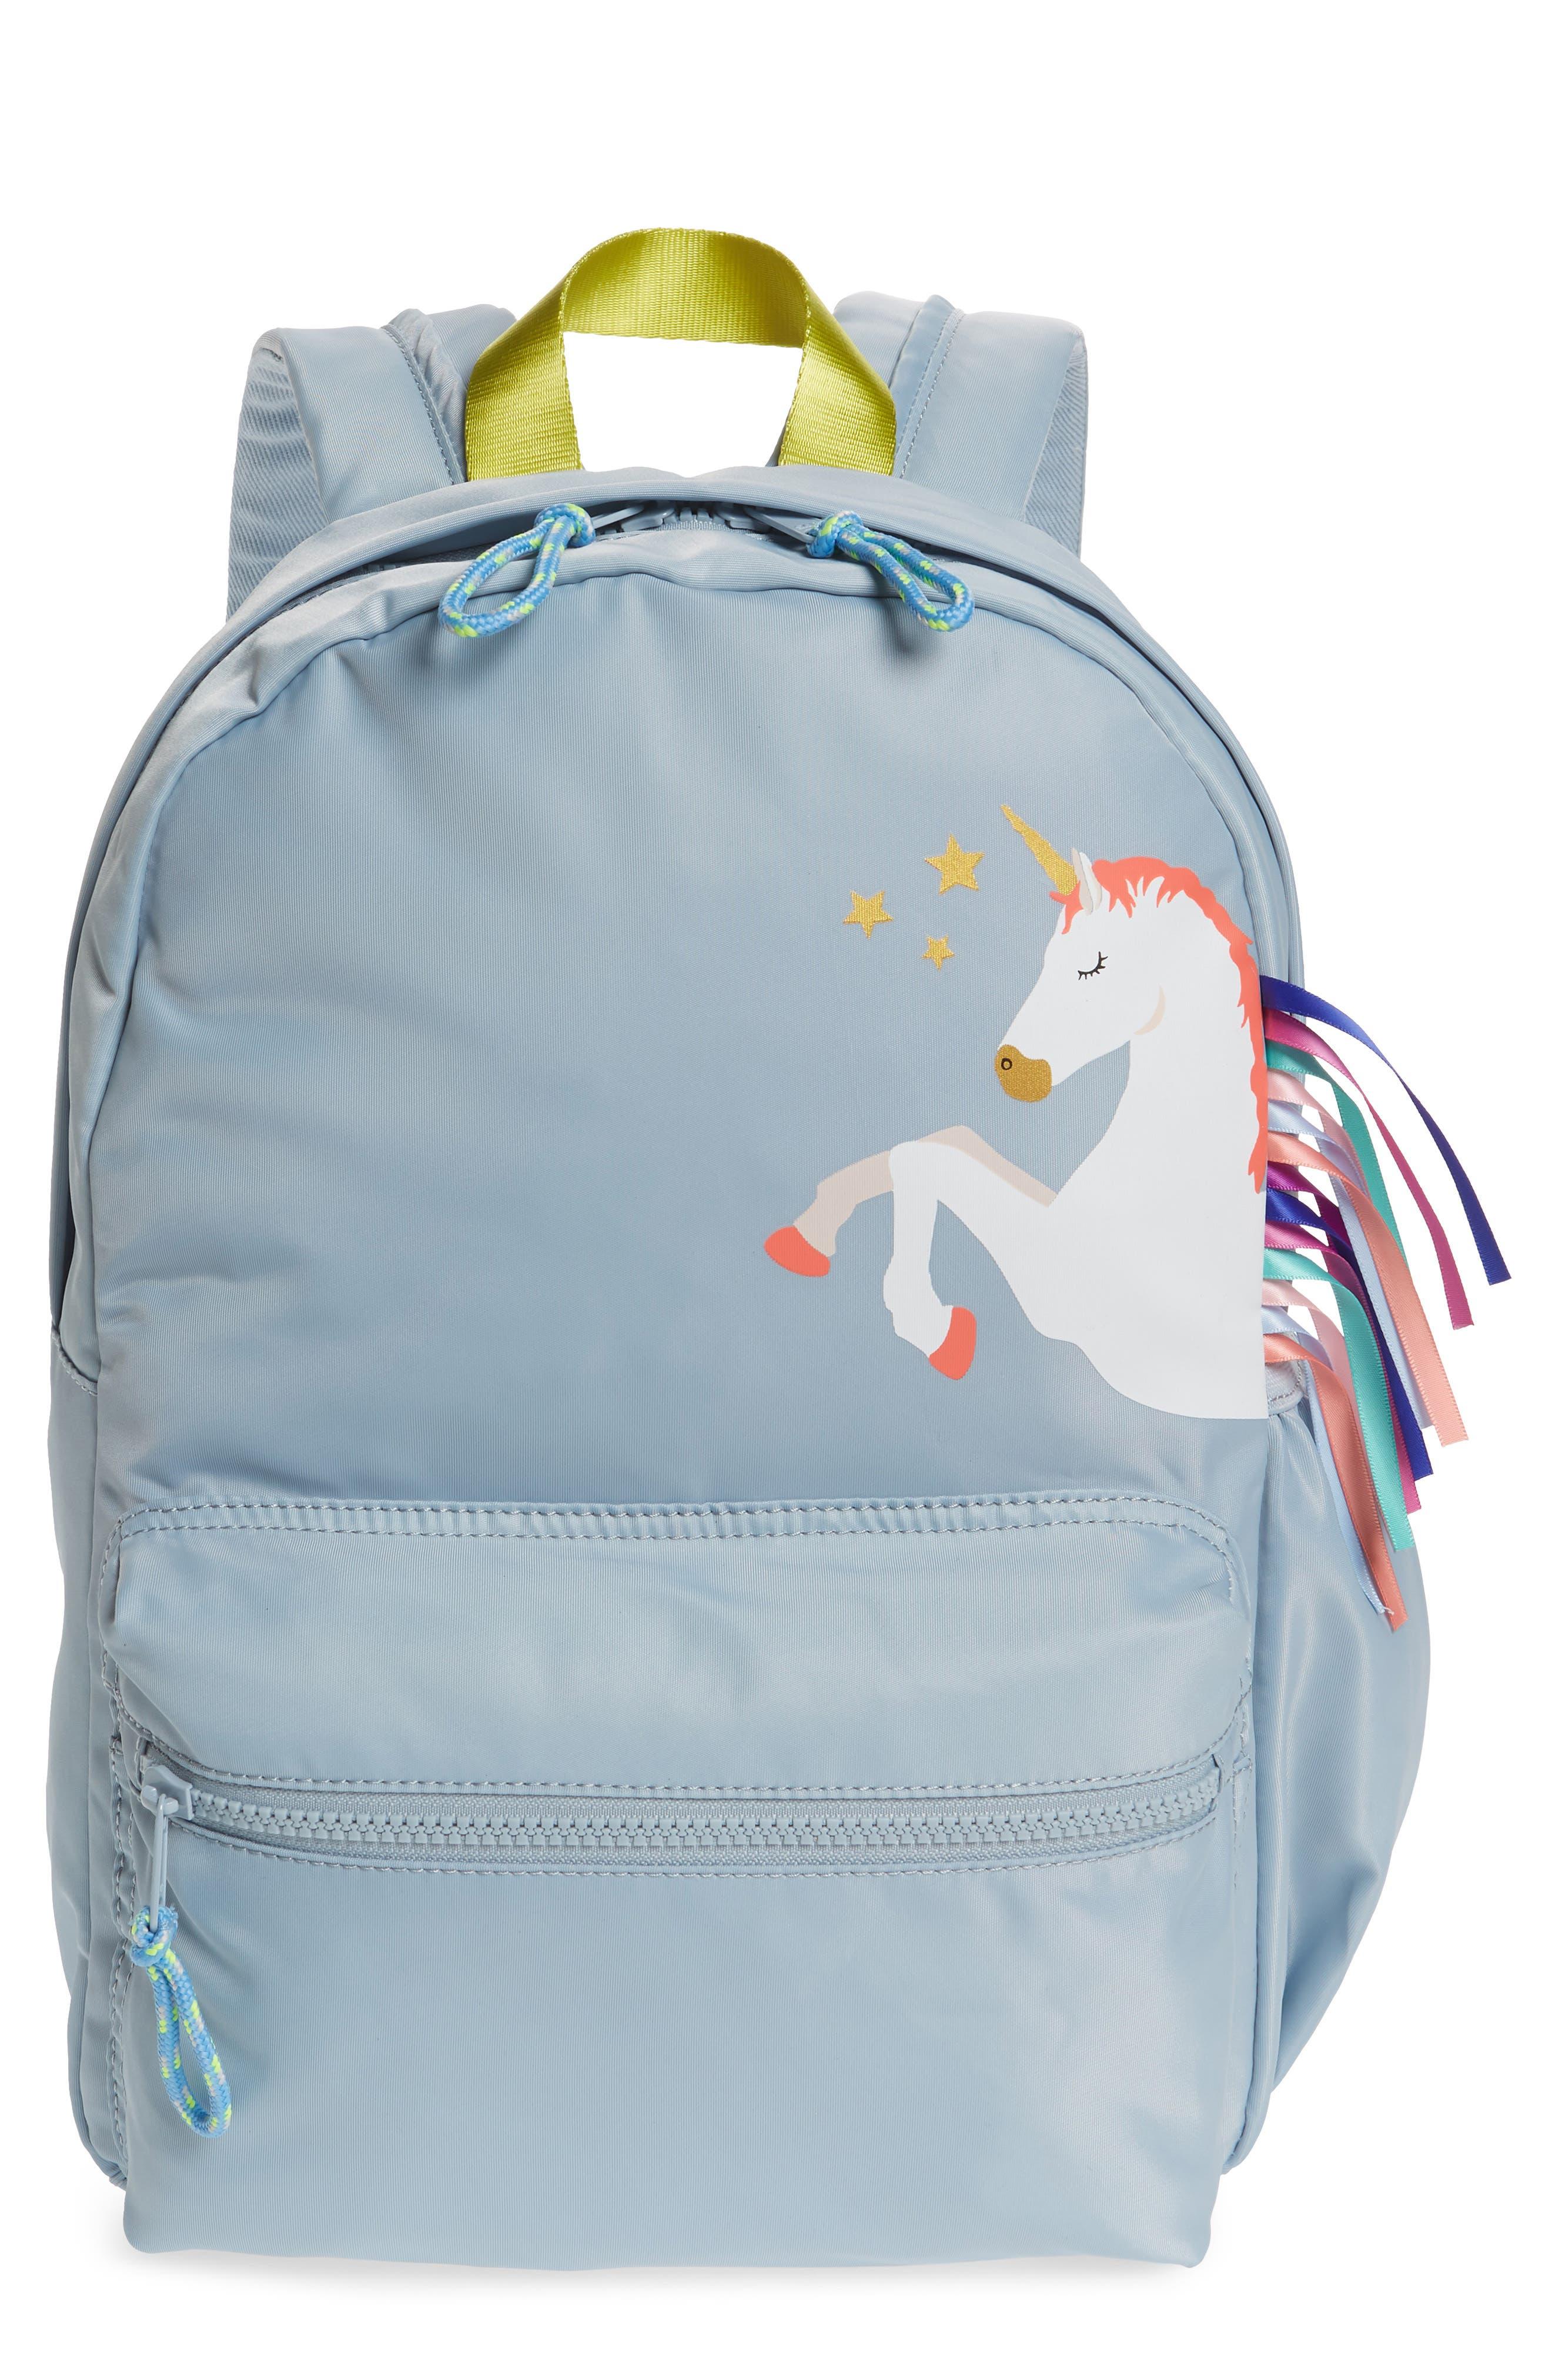 Girls Crewcuts By Jcrew Unicorn Backpack